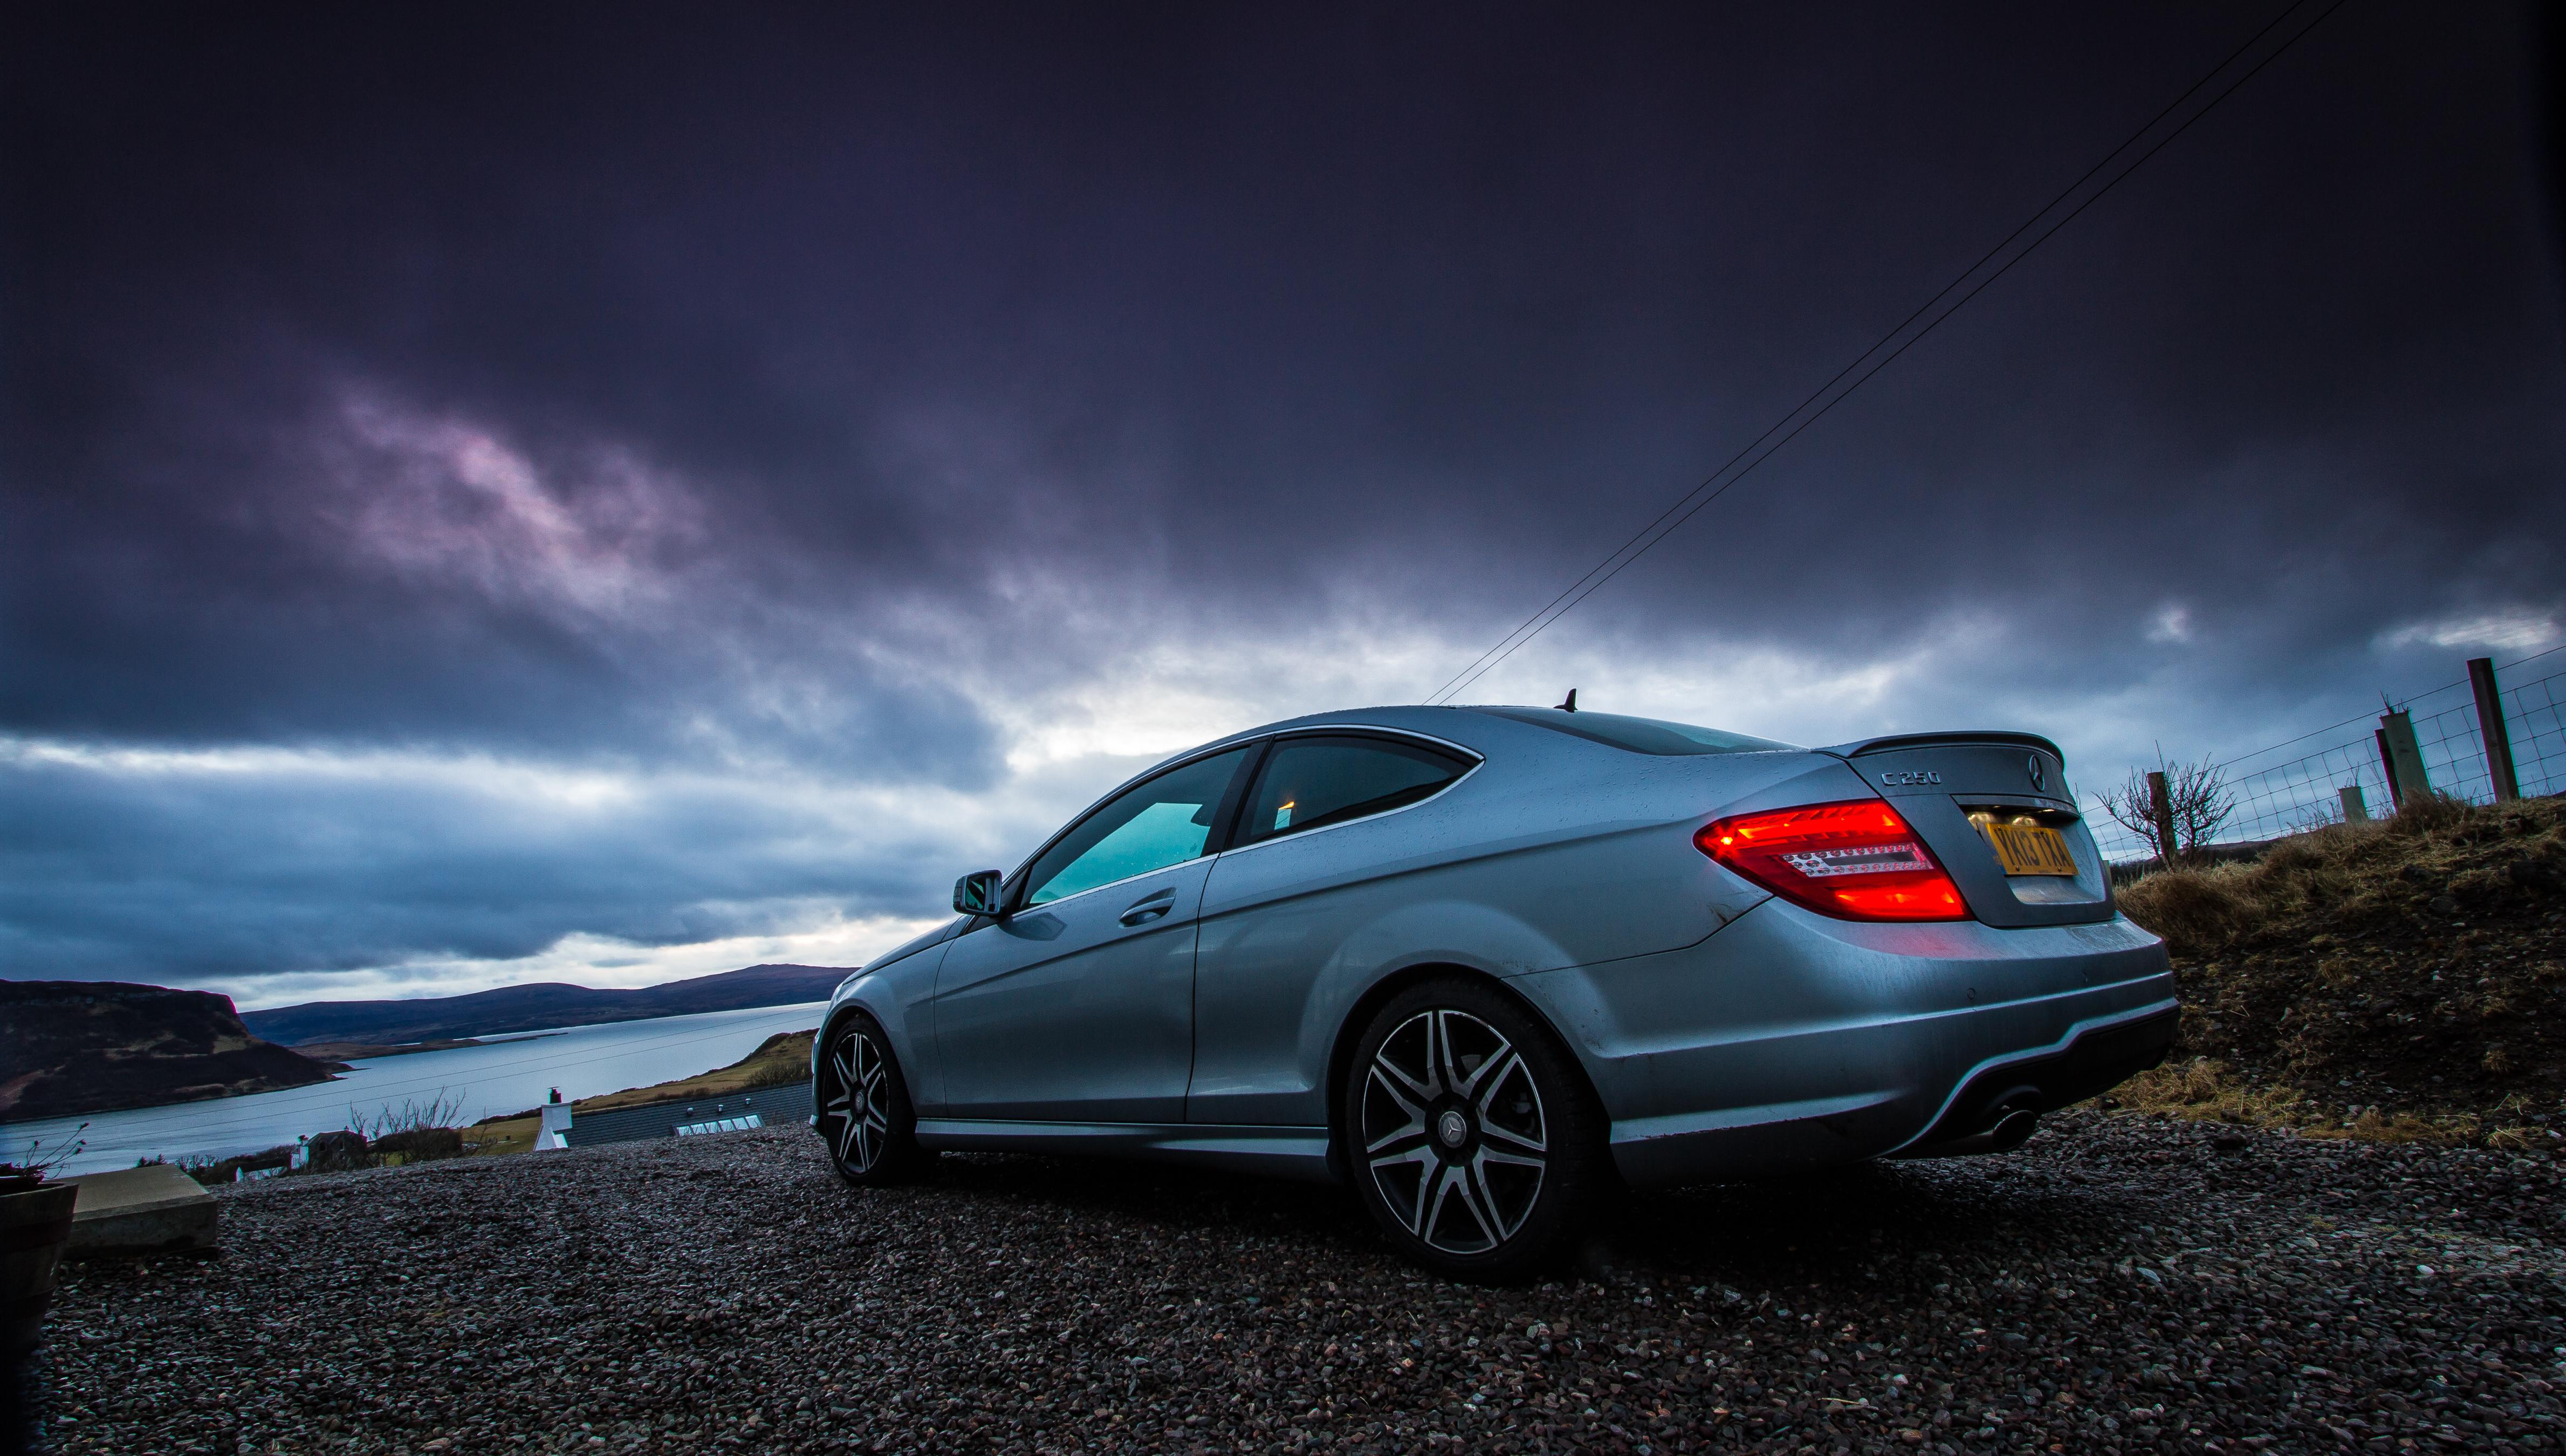 Fond D Ecran Noir Reflexion Ciel Mercedes Benz Canon Voiture